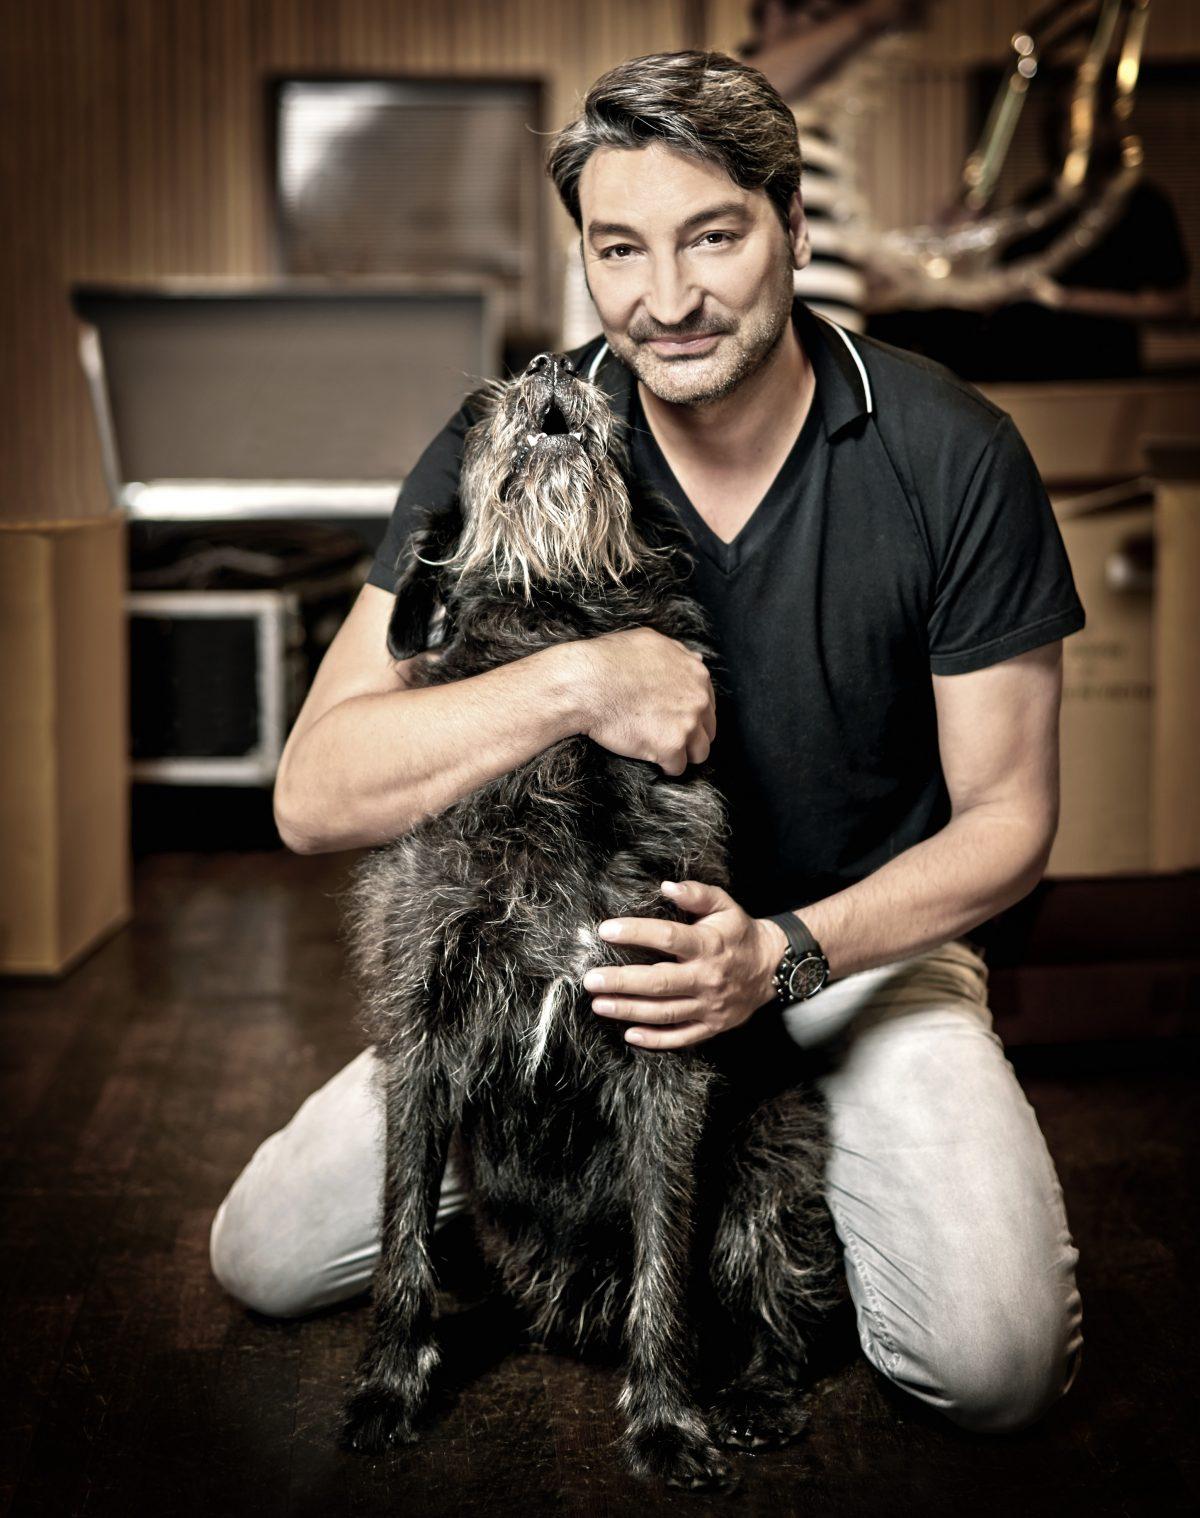 mousse-t-und-hund-nobu-für-charity-buch-prominent-mit-hund-foto-nikolaj-georgiew-www.ciaogianna.de